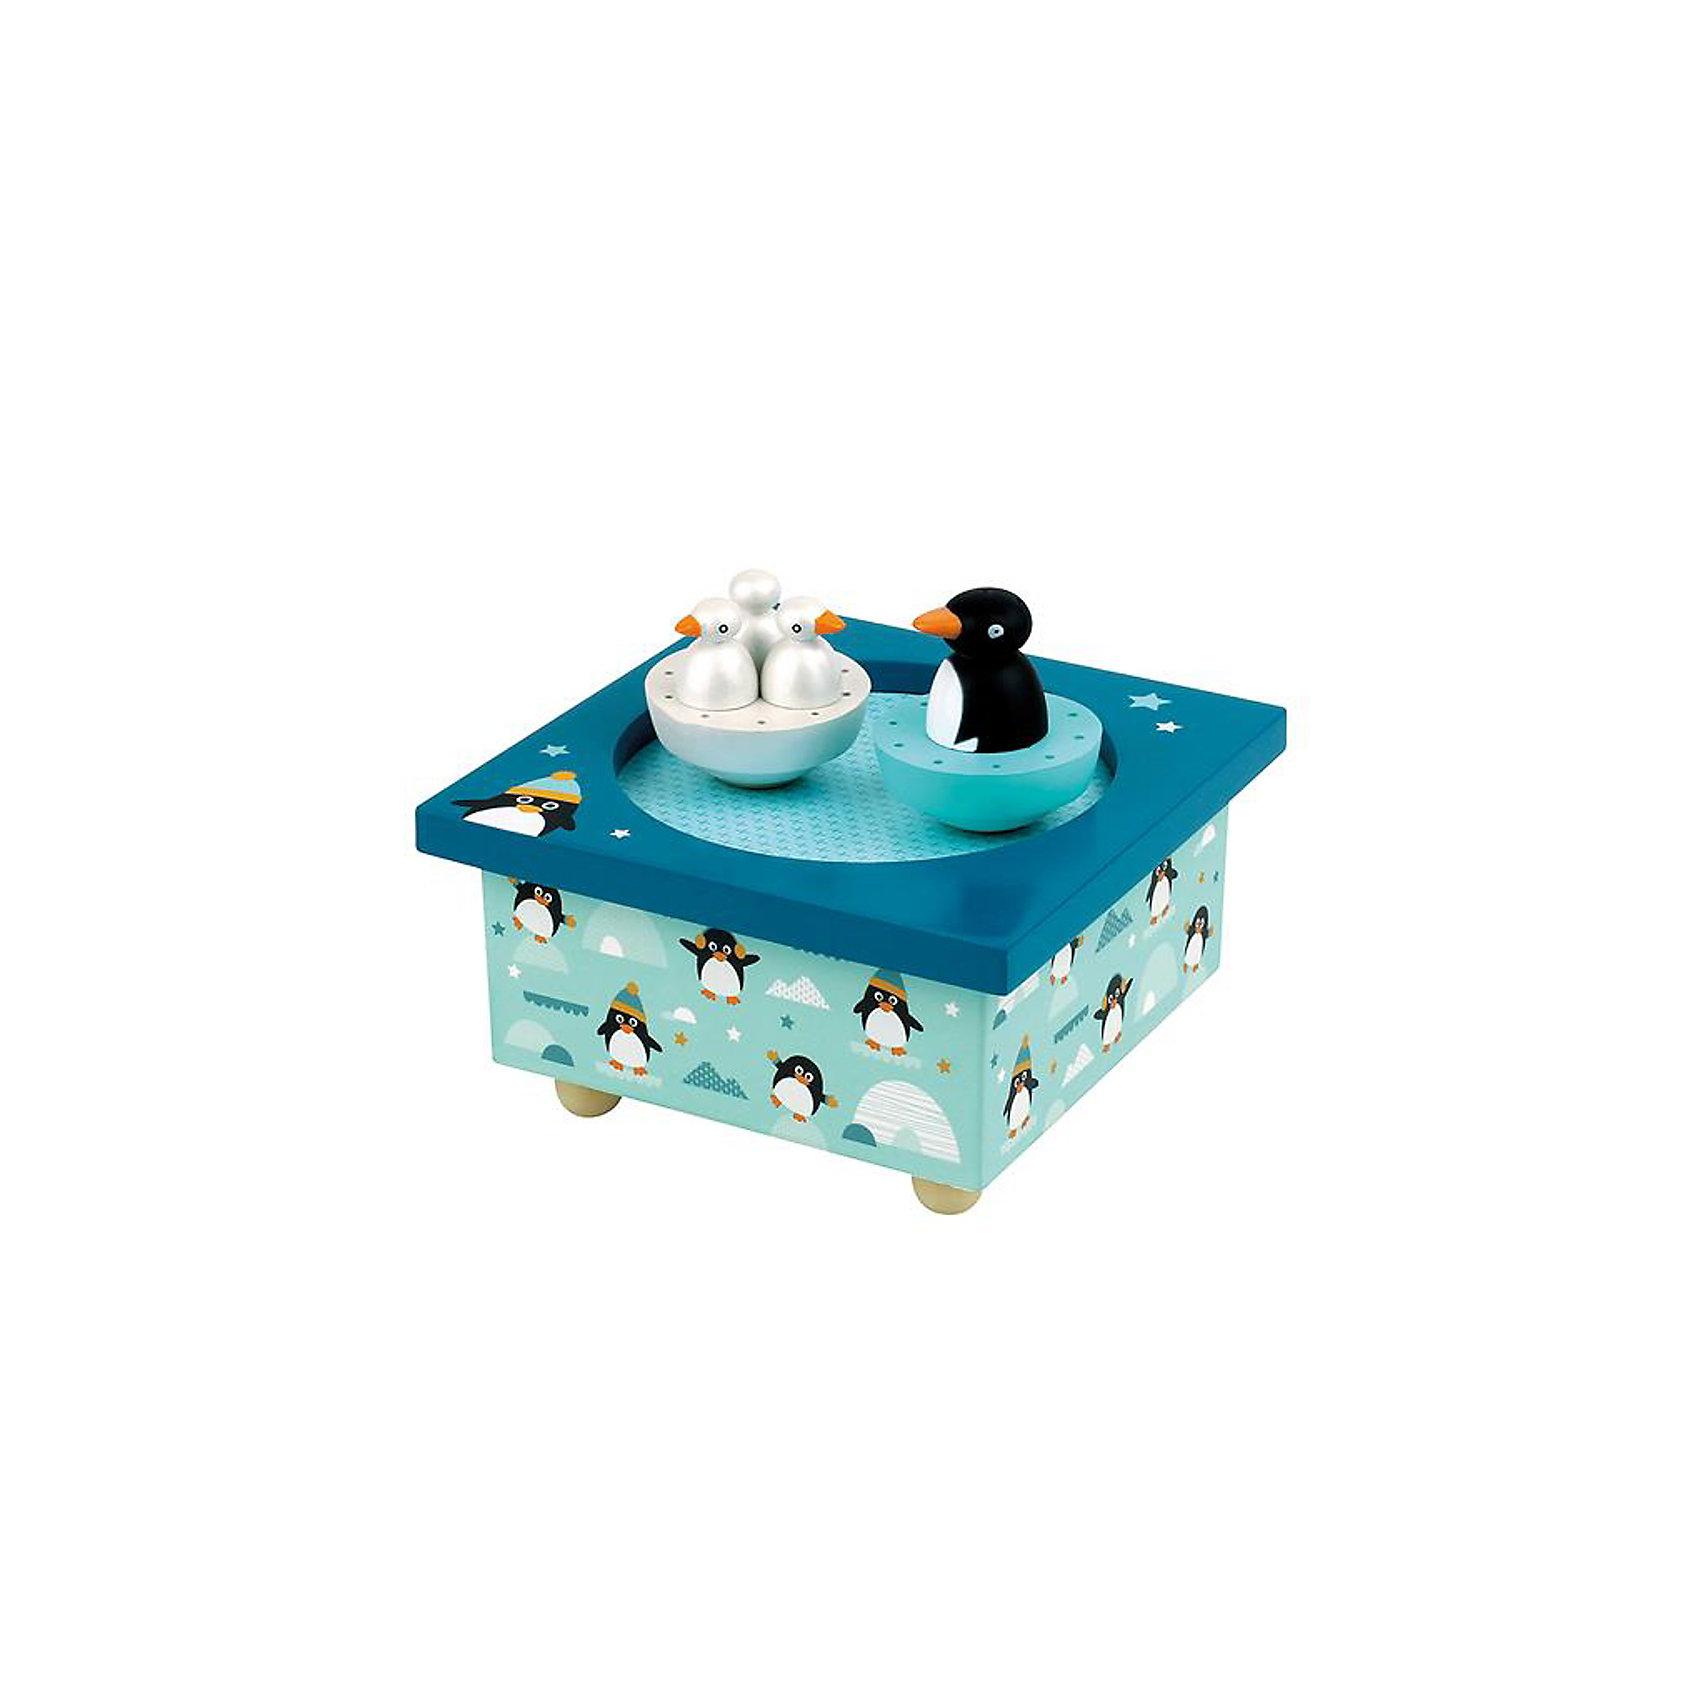 TROUSSELIER Музыкальная шкатулка Пингвин, Trousselier jakos музыкальная шкатулка феи в листьях